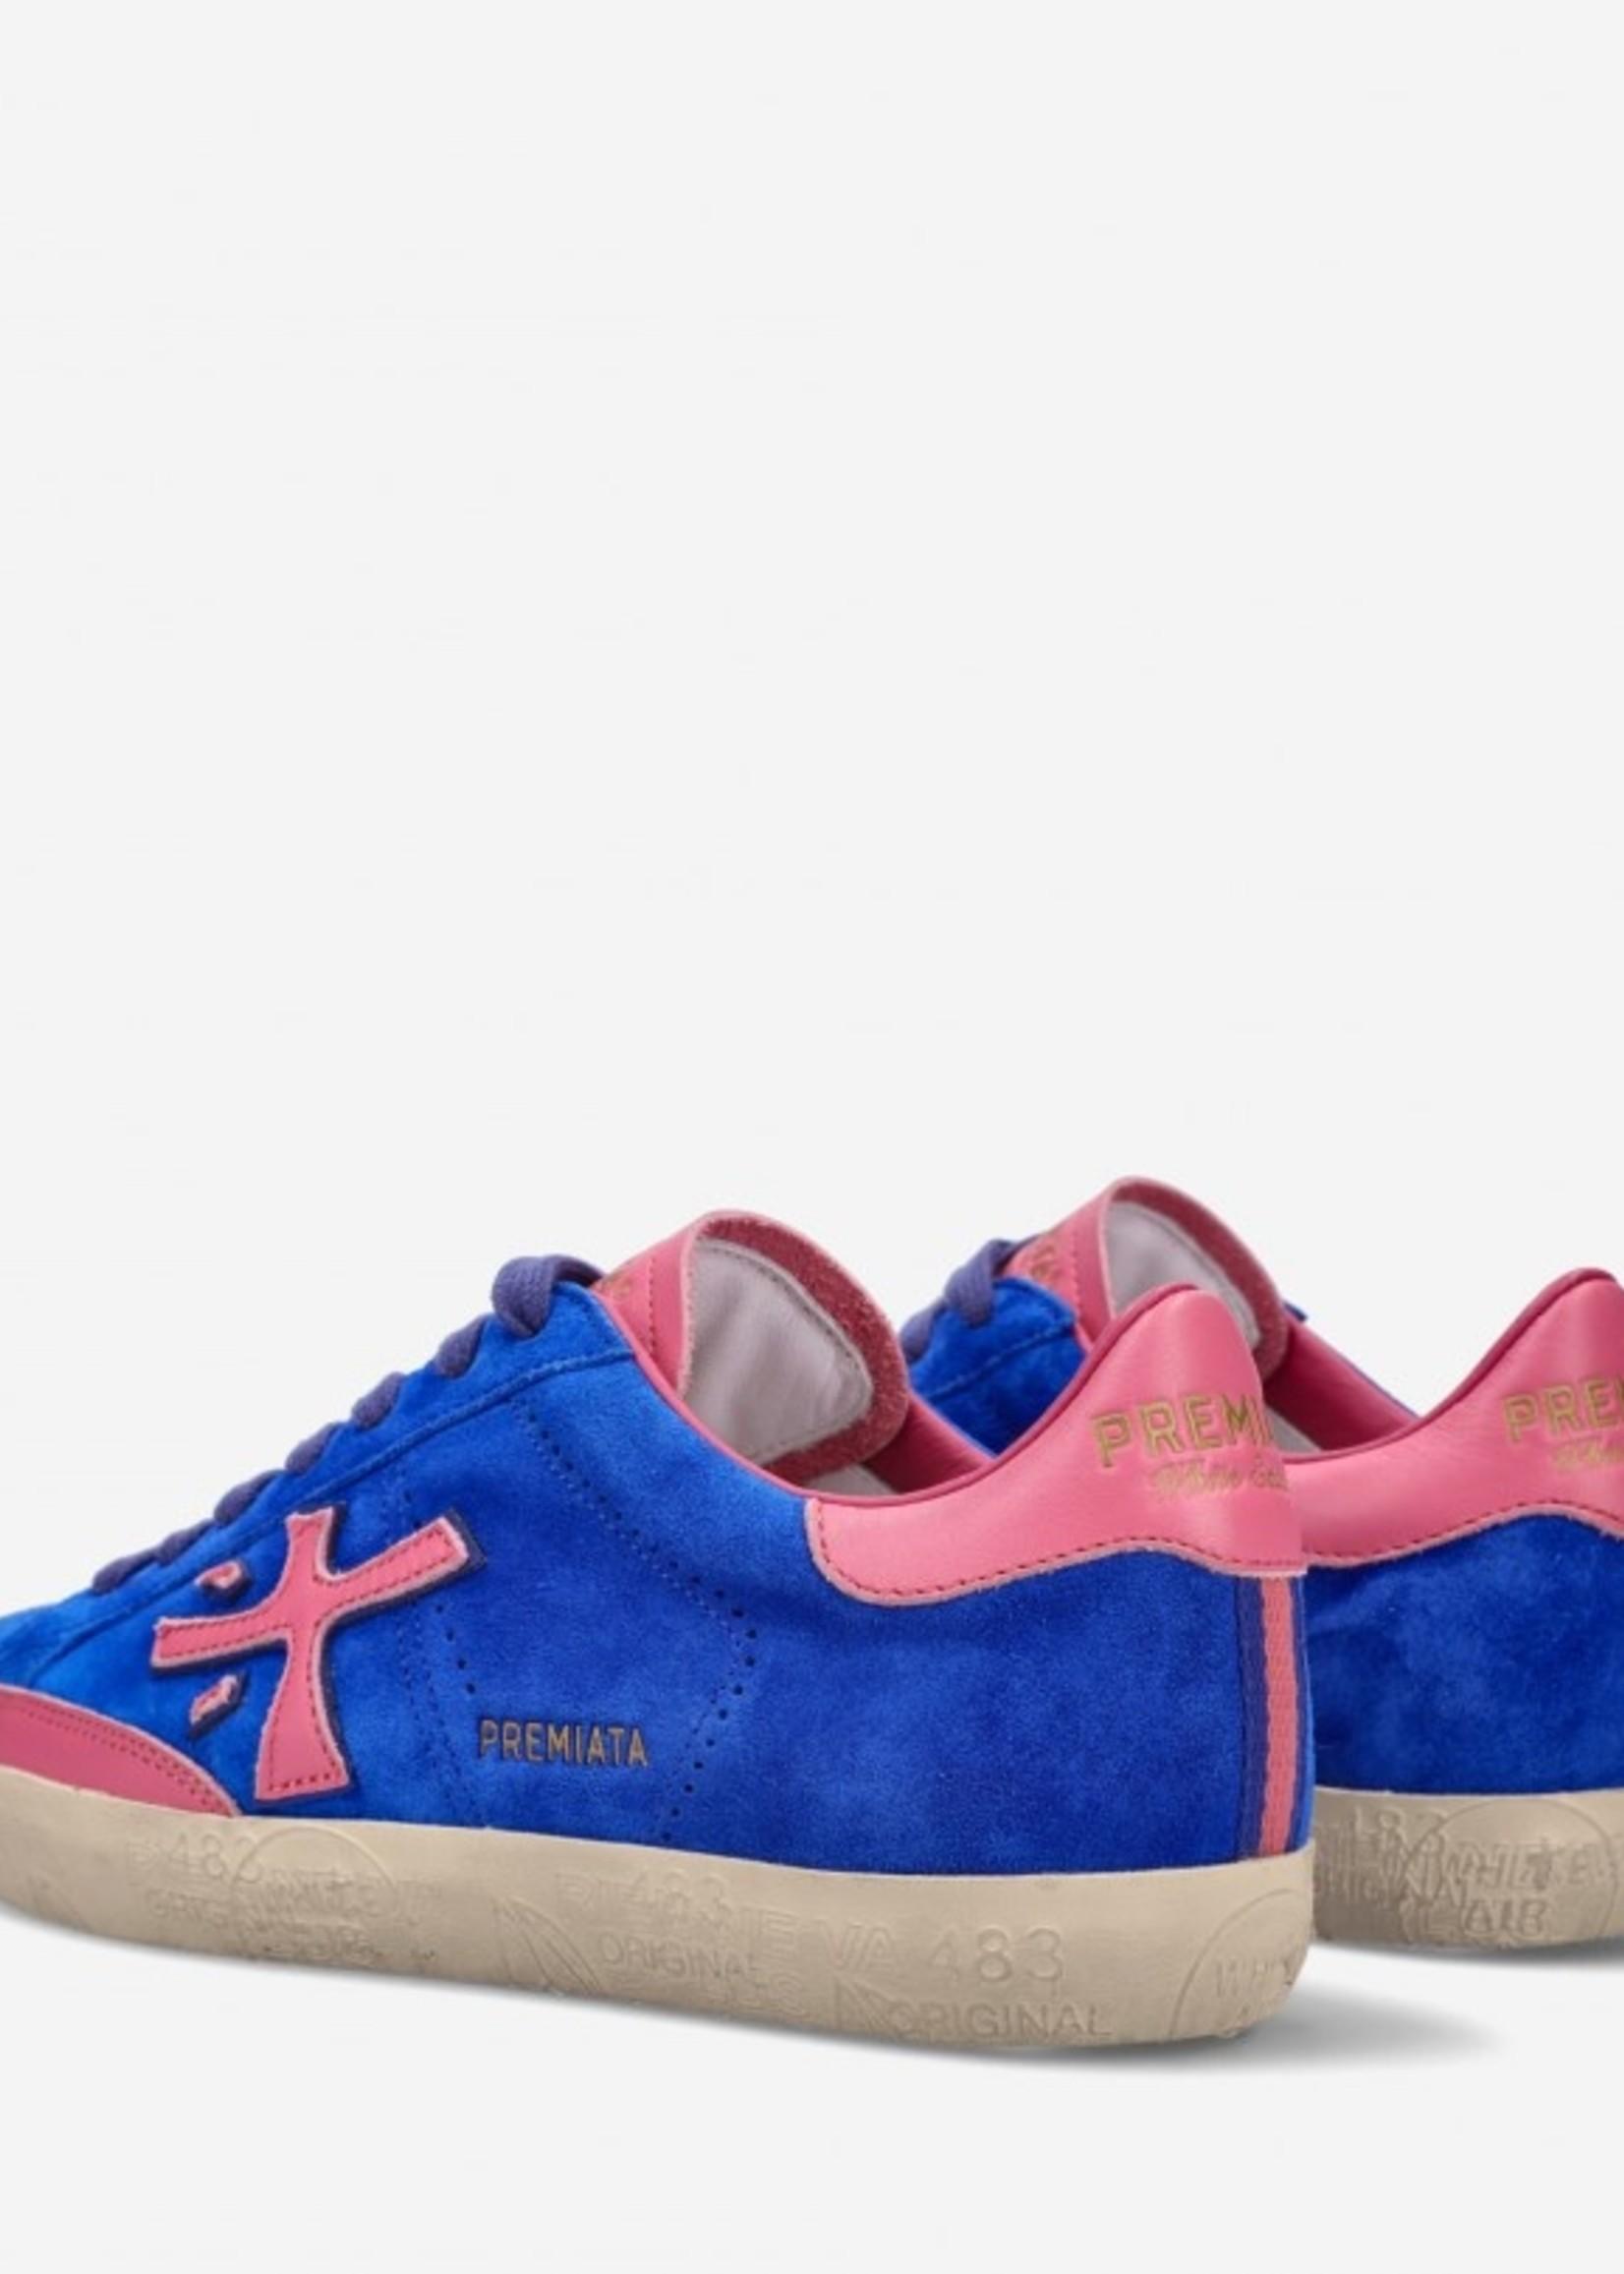 premiata Premiata sneakers stevend blue/pink